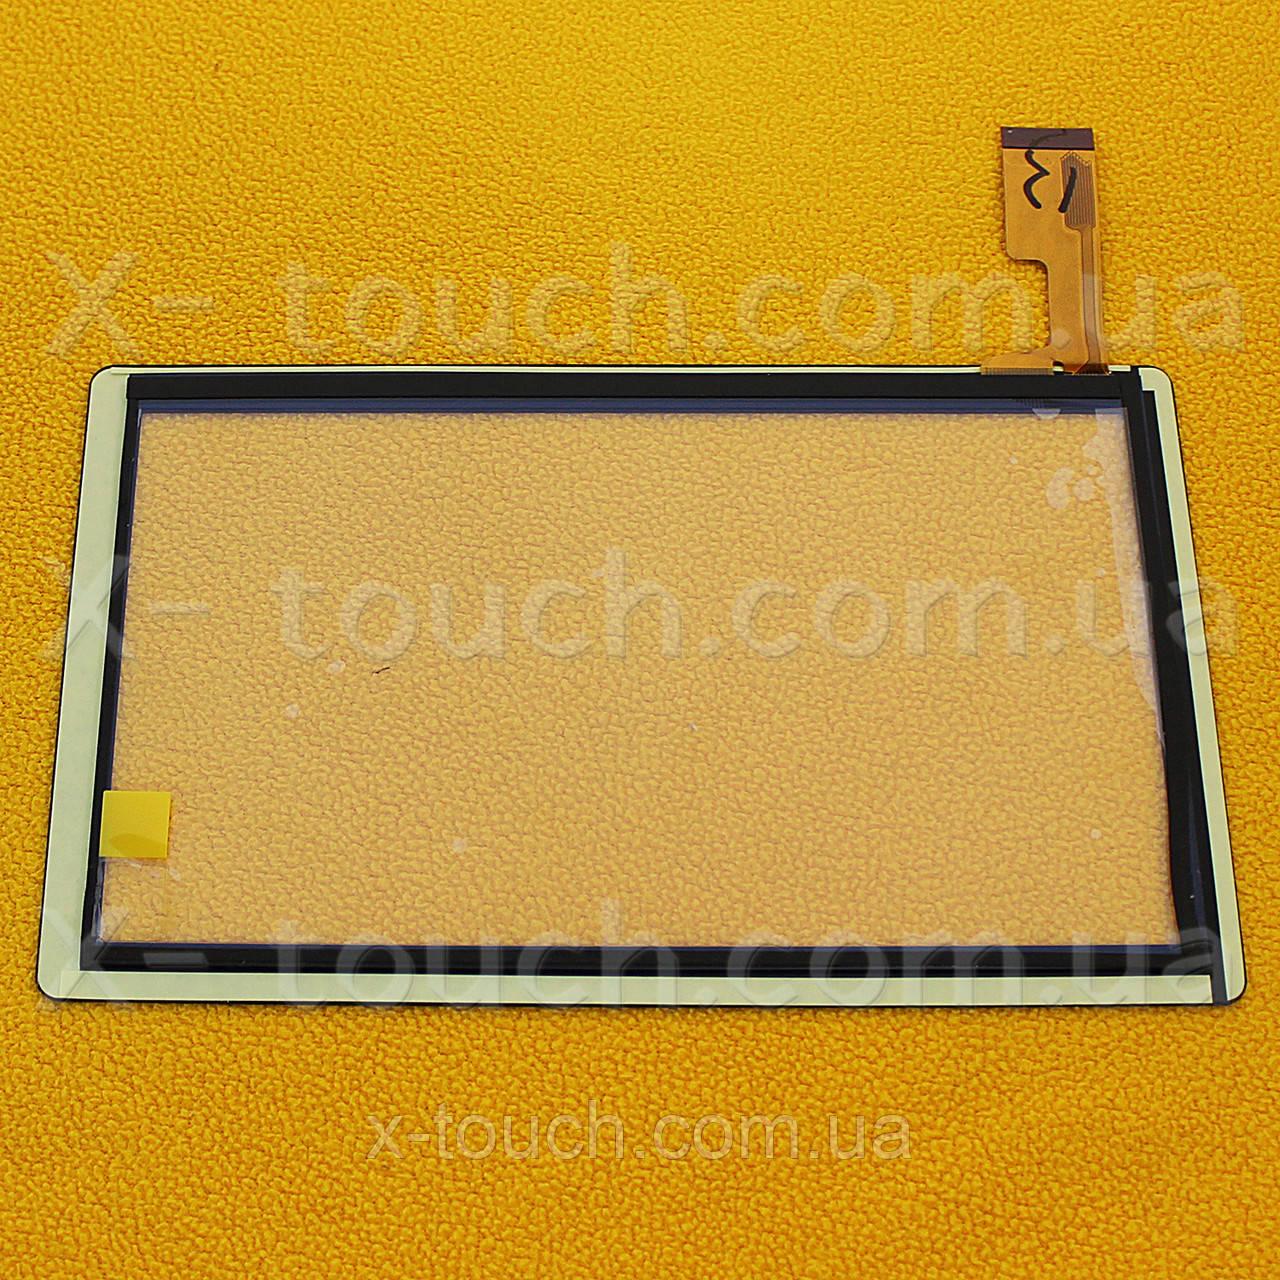 Тачскрин, сенсор  ZYD 070-47  для планшета